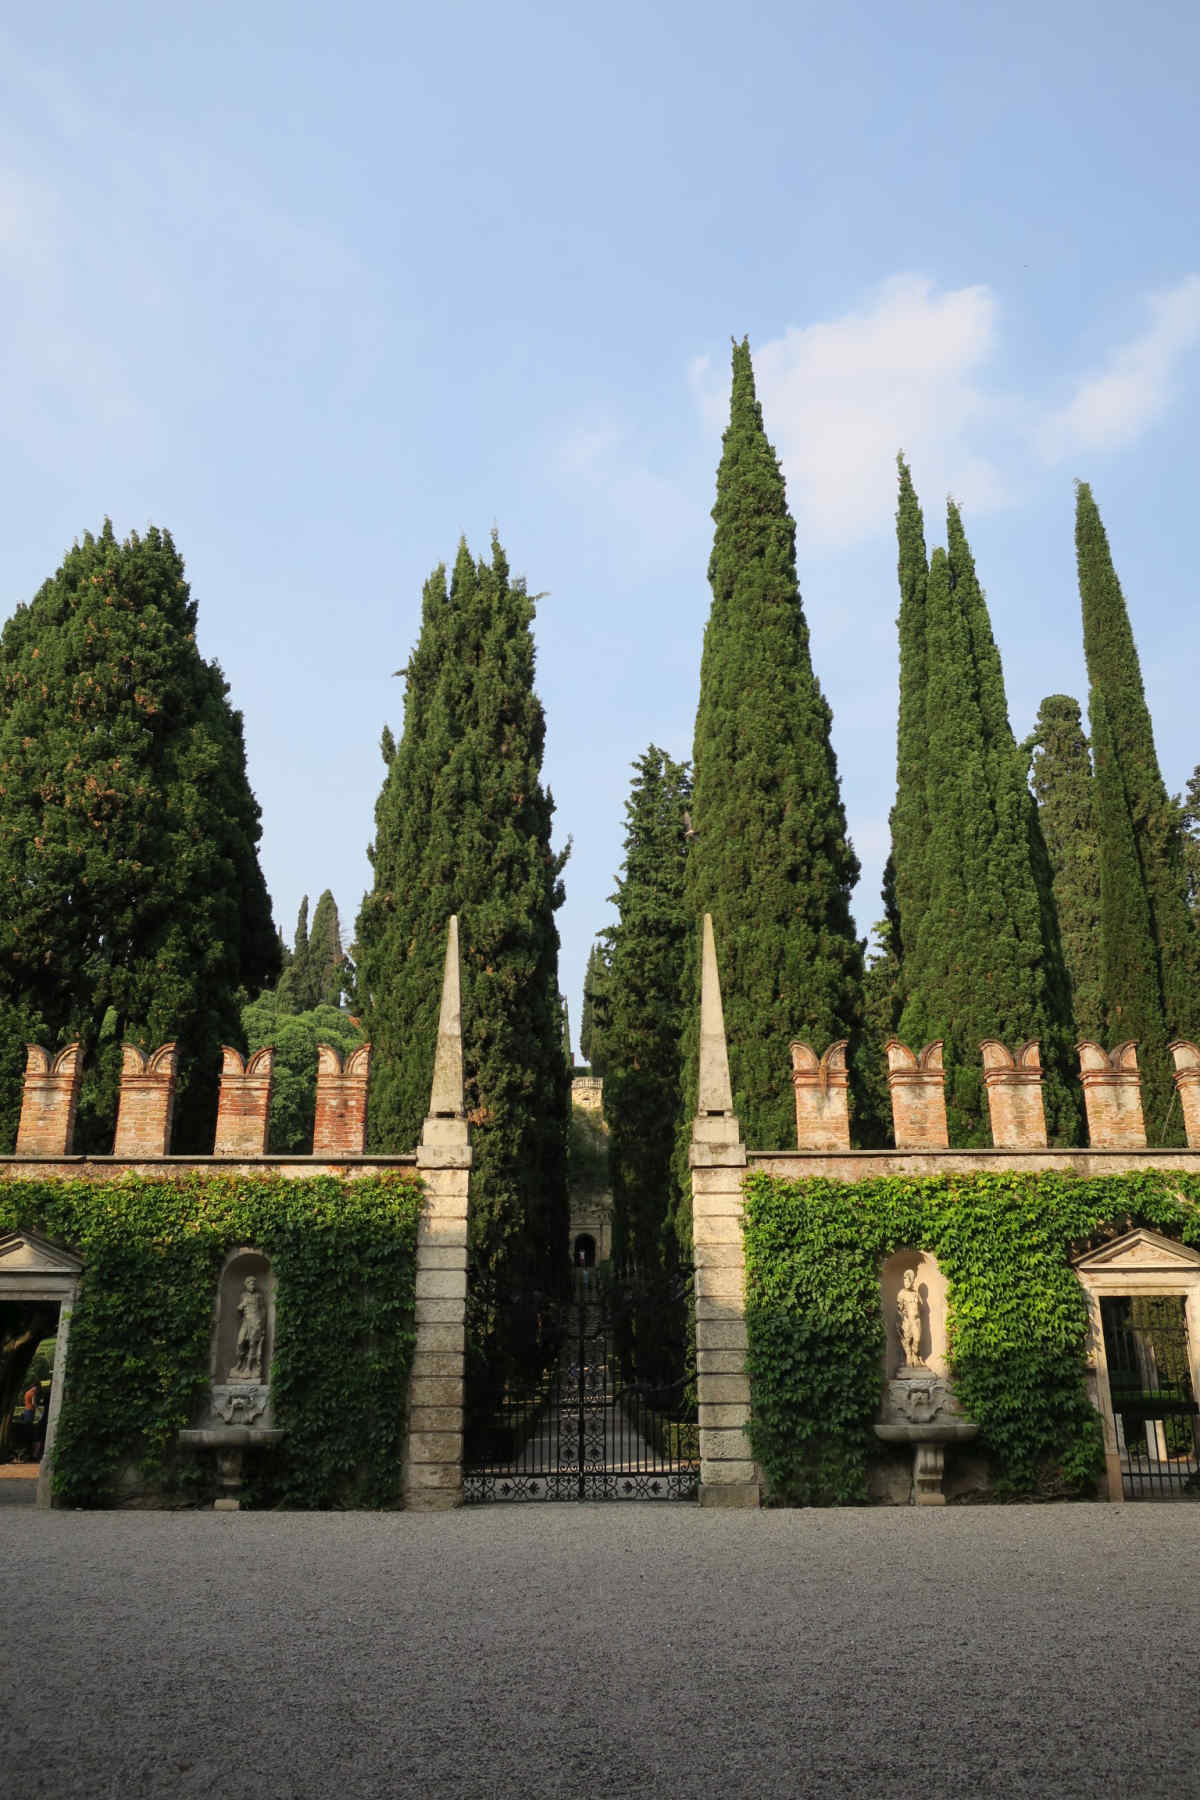 Eingang zum Giardino Giusti